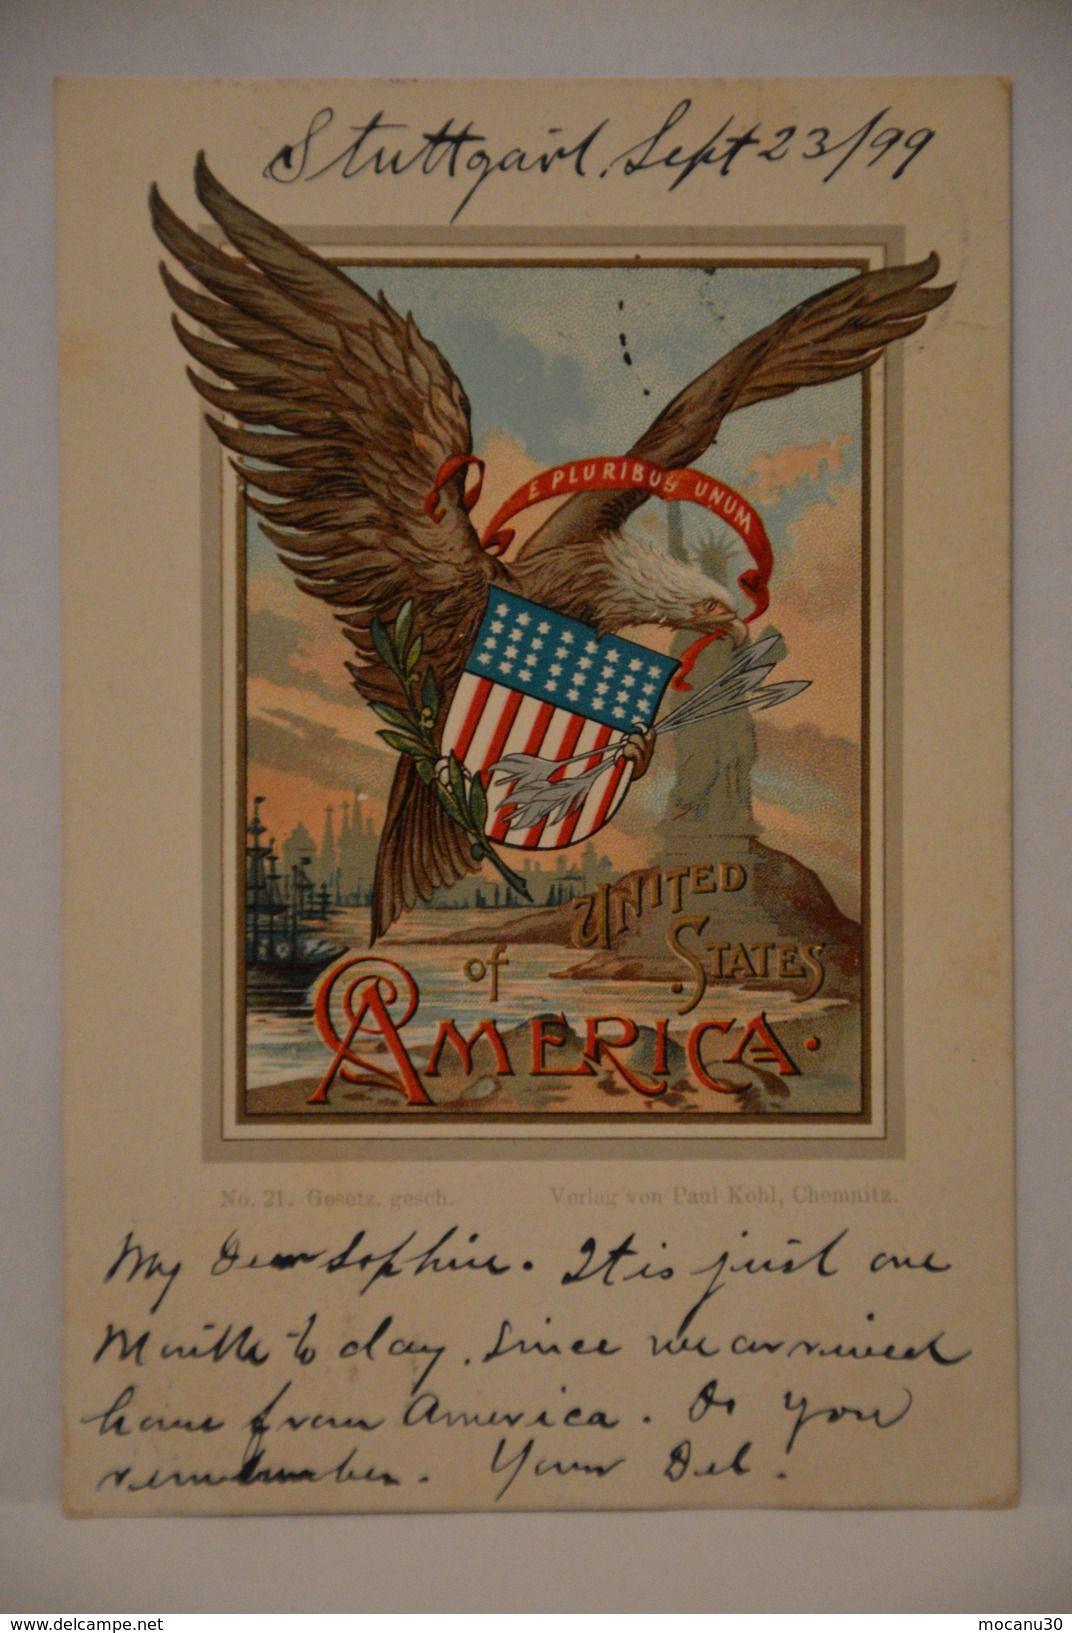 4b729d2b2b7 UNITED STATES OF AMERICA EAGLE dated 1899 - RARE Old Postcard By PAUL KOHL  CHEMNITZ